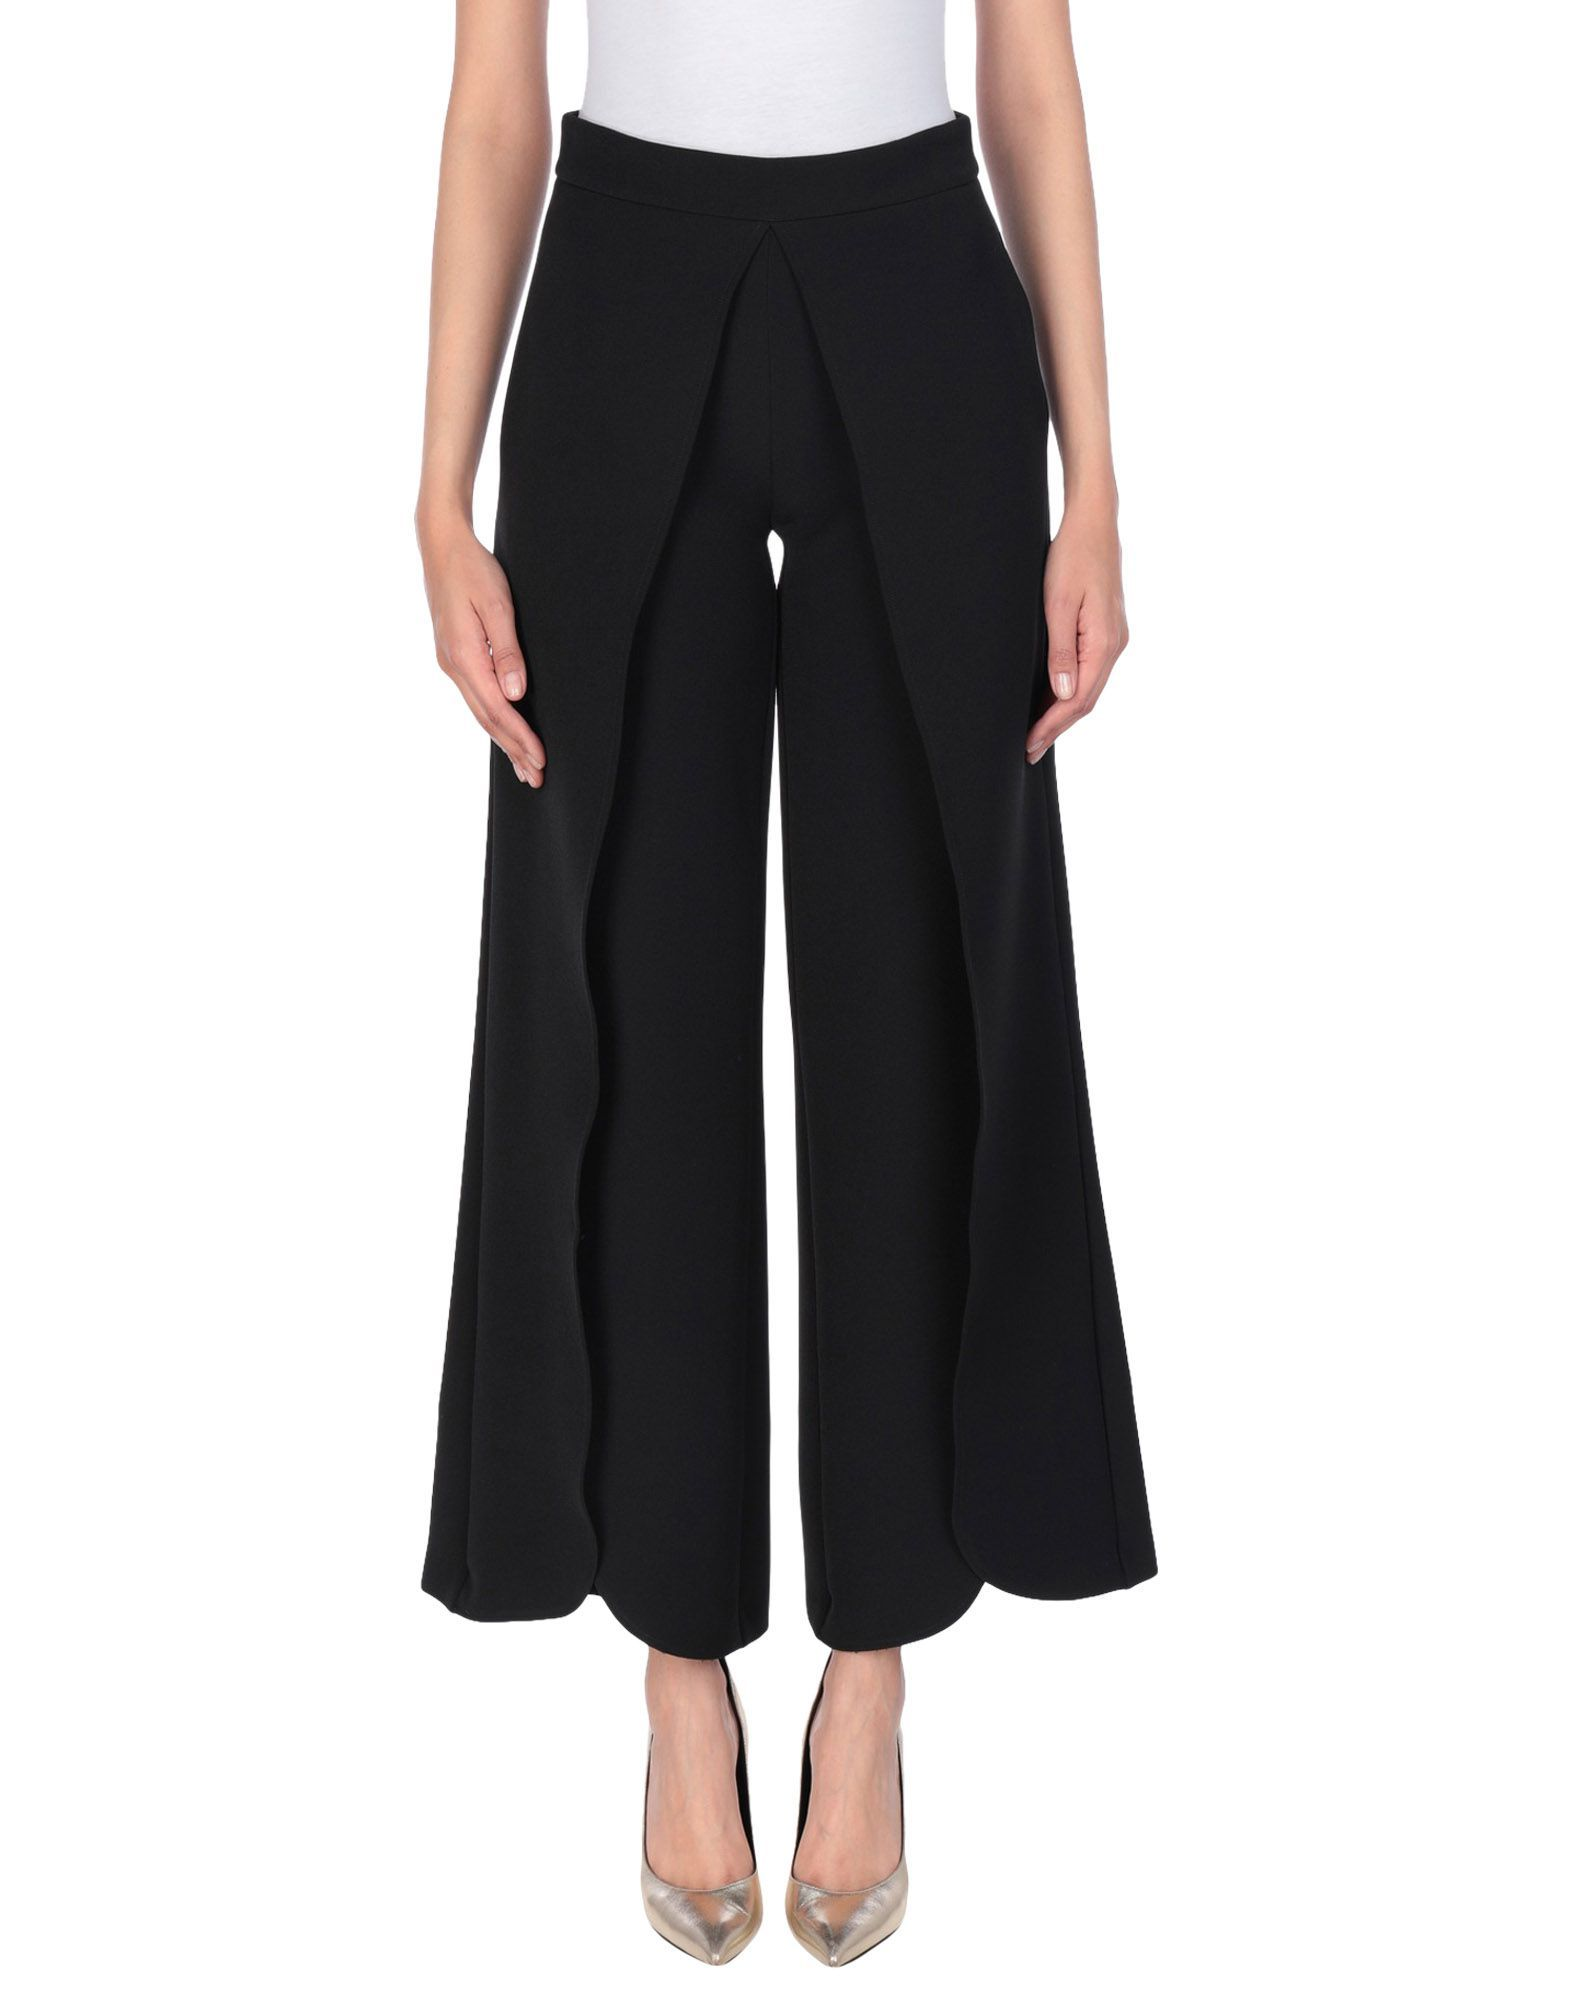 Cristinaeffe Black Scalloped Hem Cropped Trousers